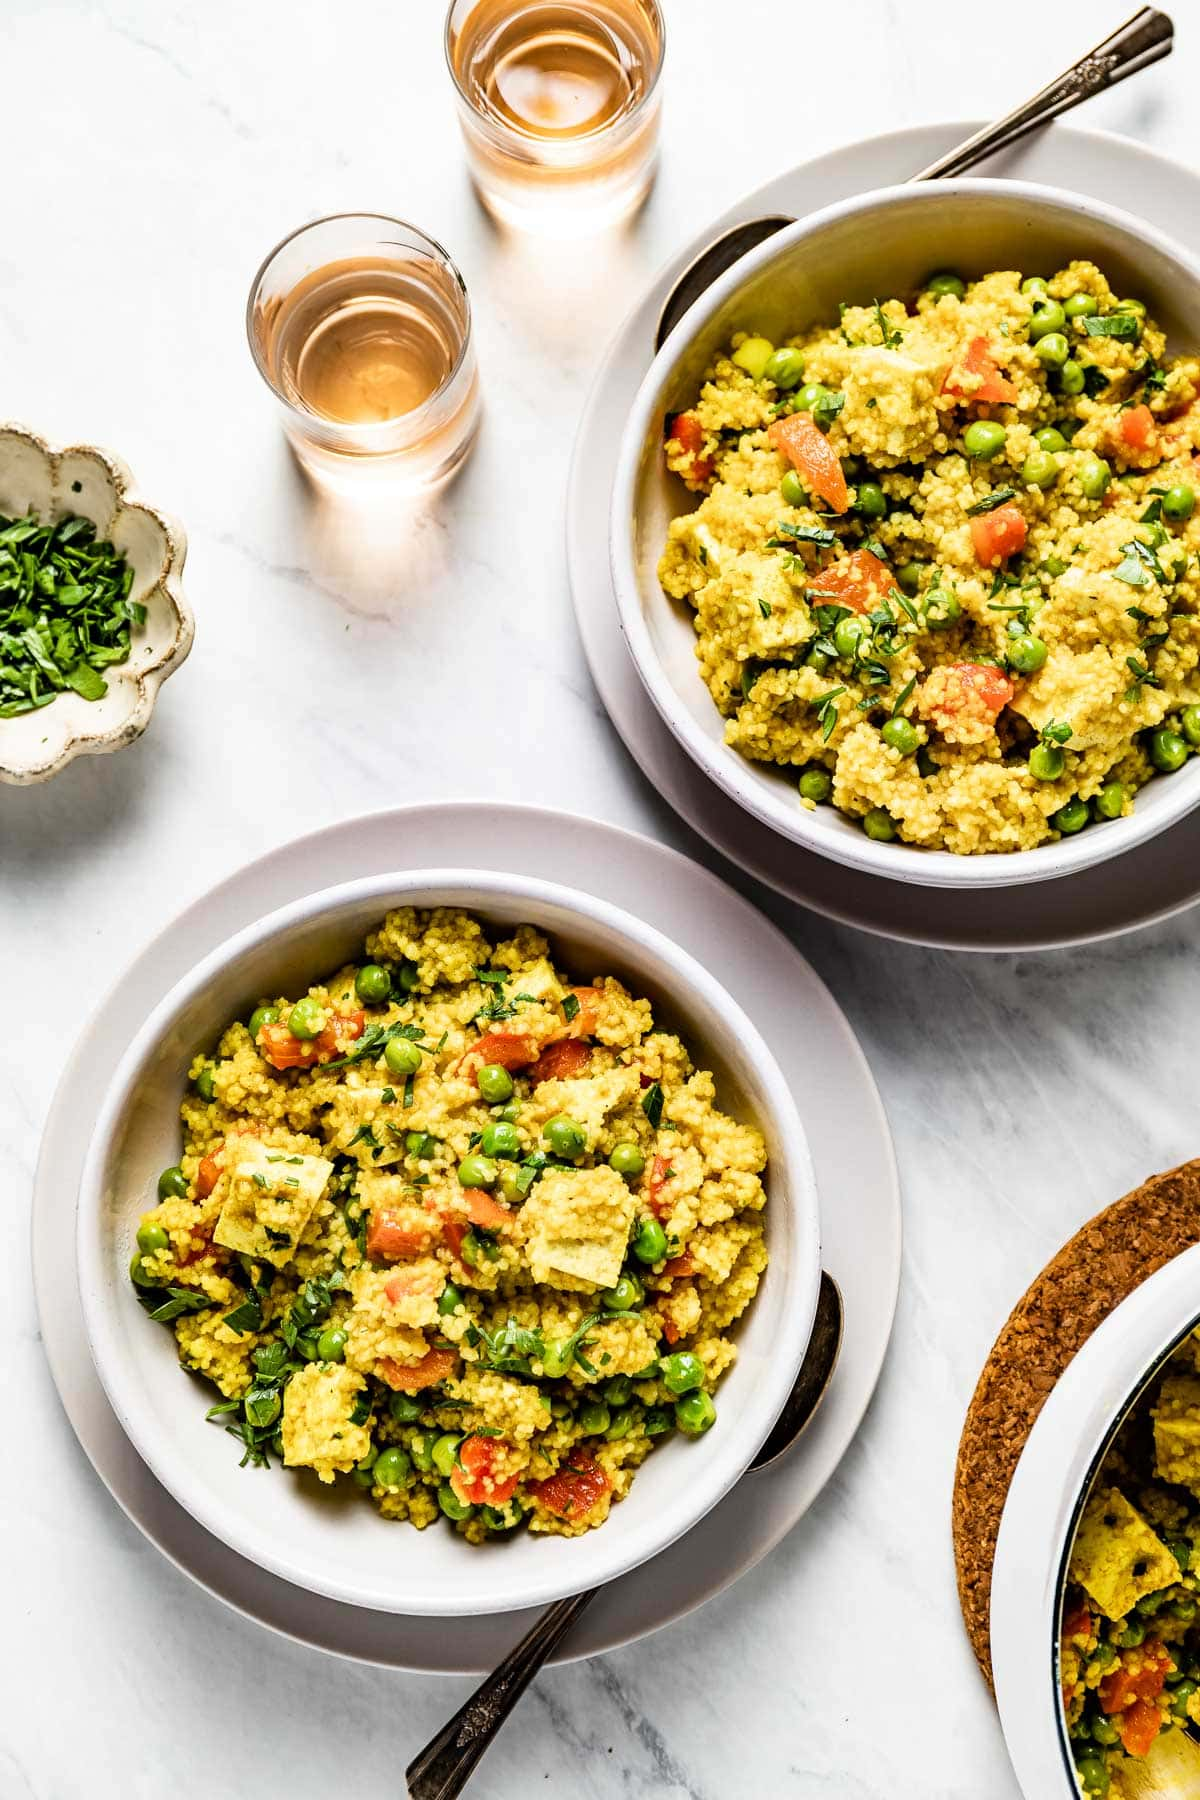 bowls of the couscous